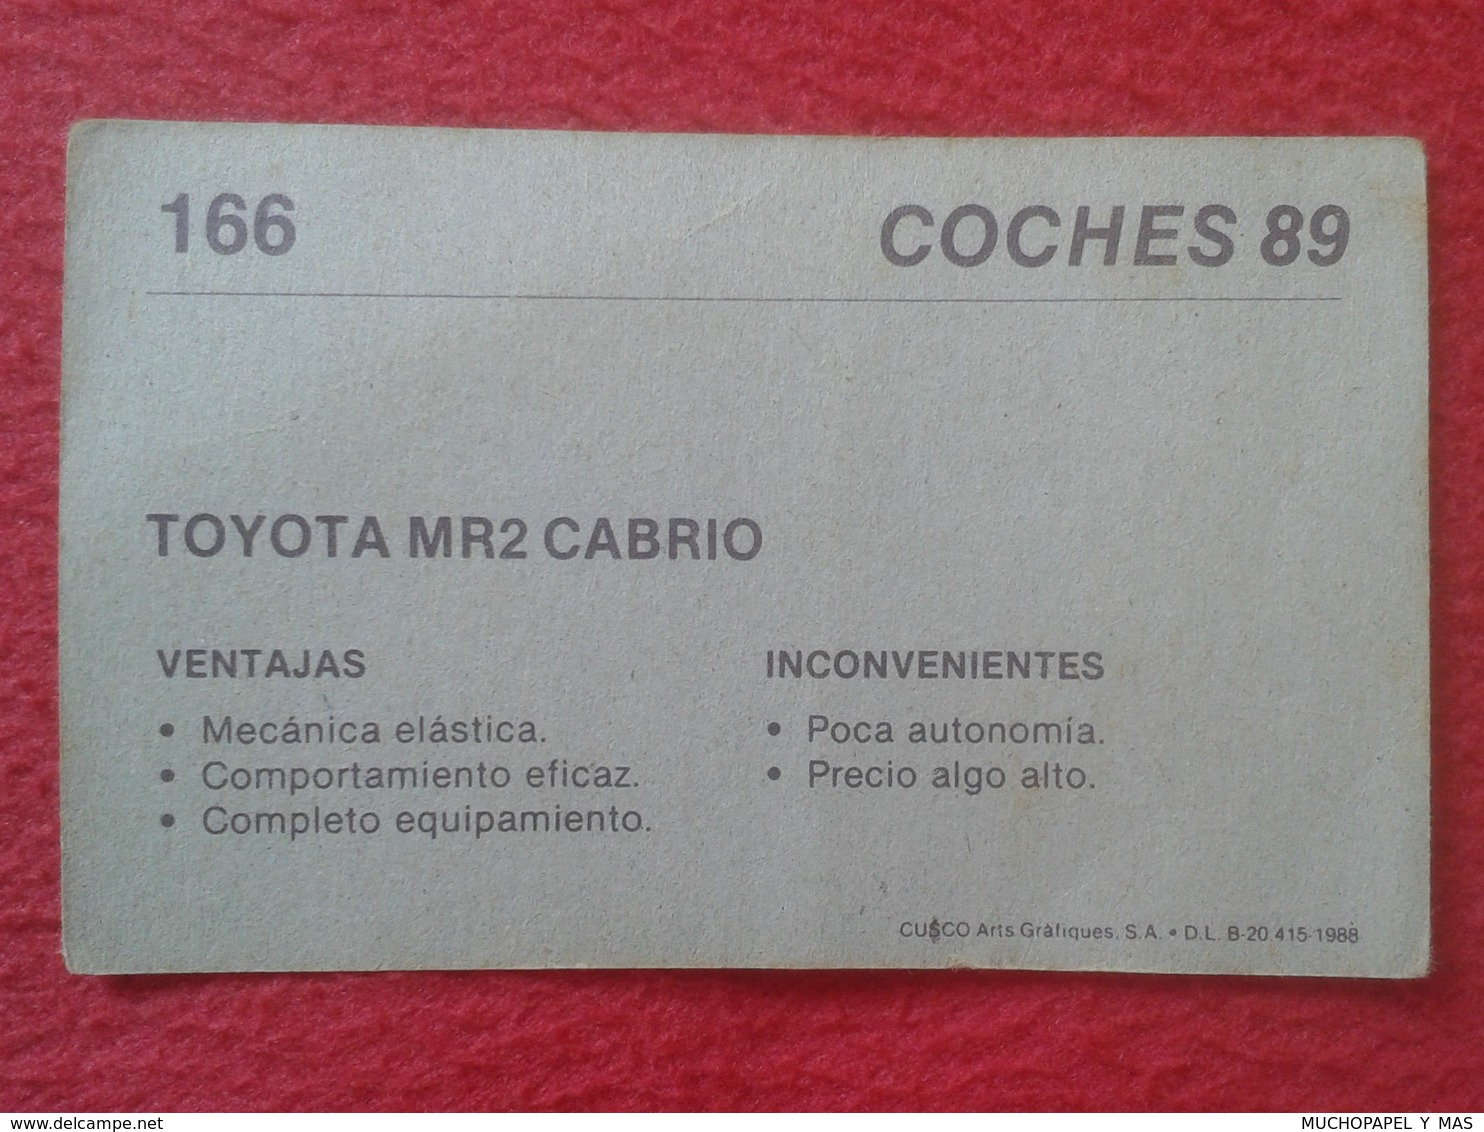 SPAIN ESPAGNE. ANTIGUO OLD CROMO ESTAMPA 1988 COCHES 89 COCHE CAR CARS AUTO AUTOMÓVIL TOYOTA MR 2 CABRIO JAPAN NIPPON - Cromos